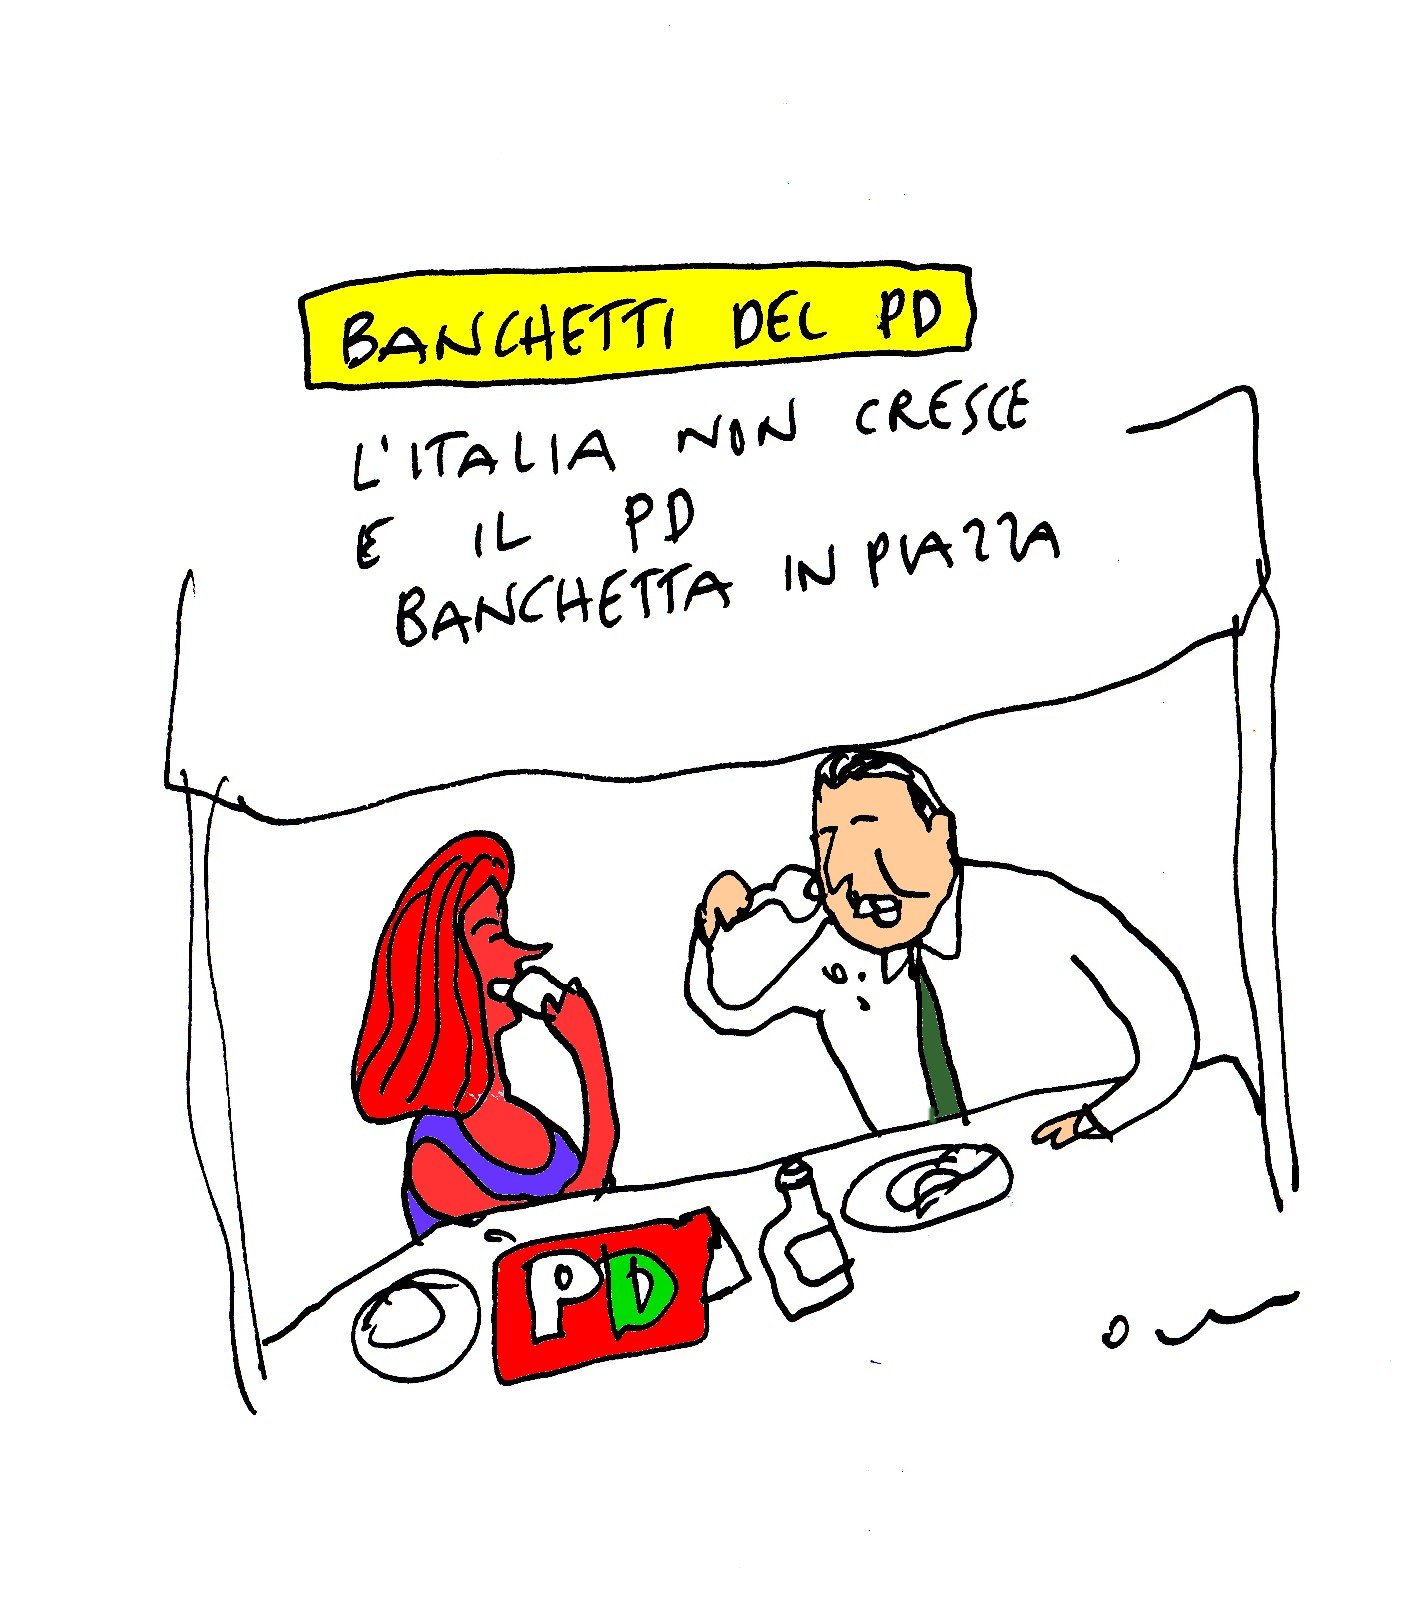 banchetti pkd